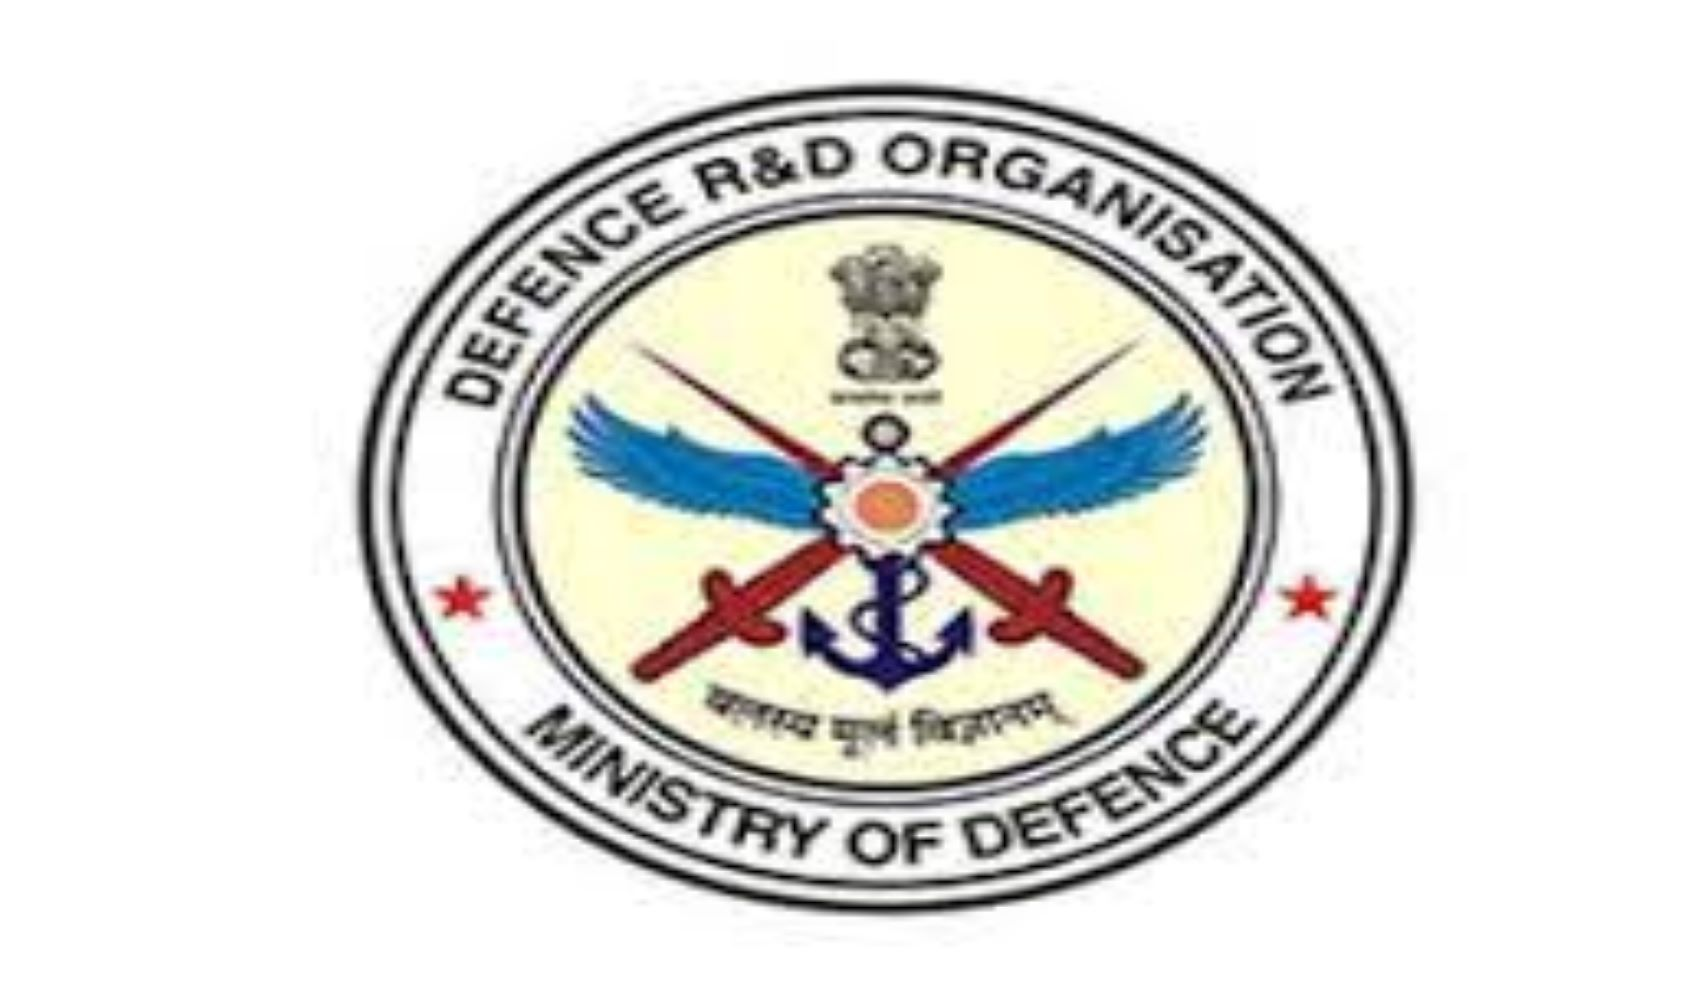 A regular MTech programme in Defence Technology